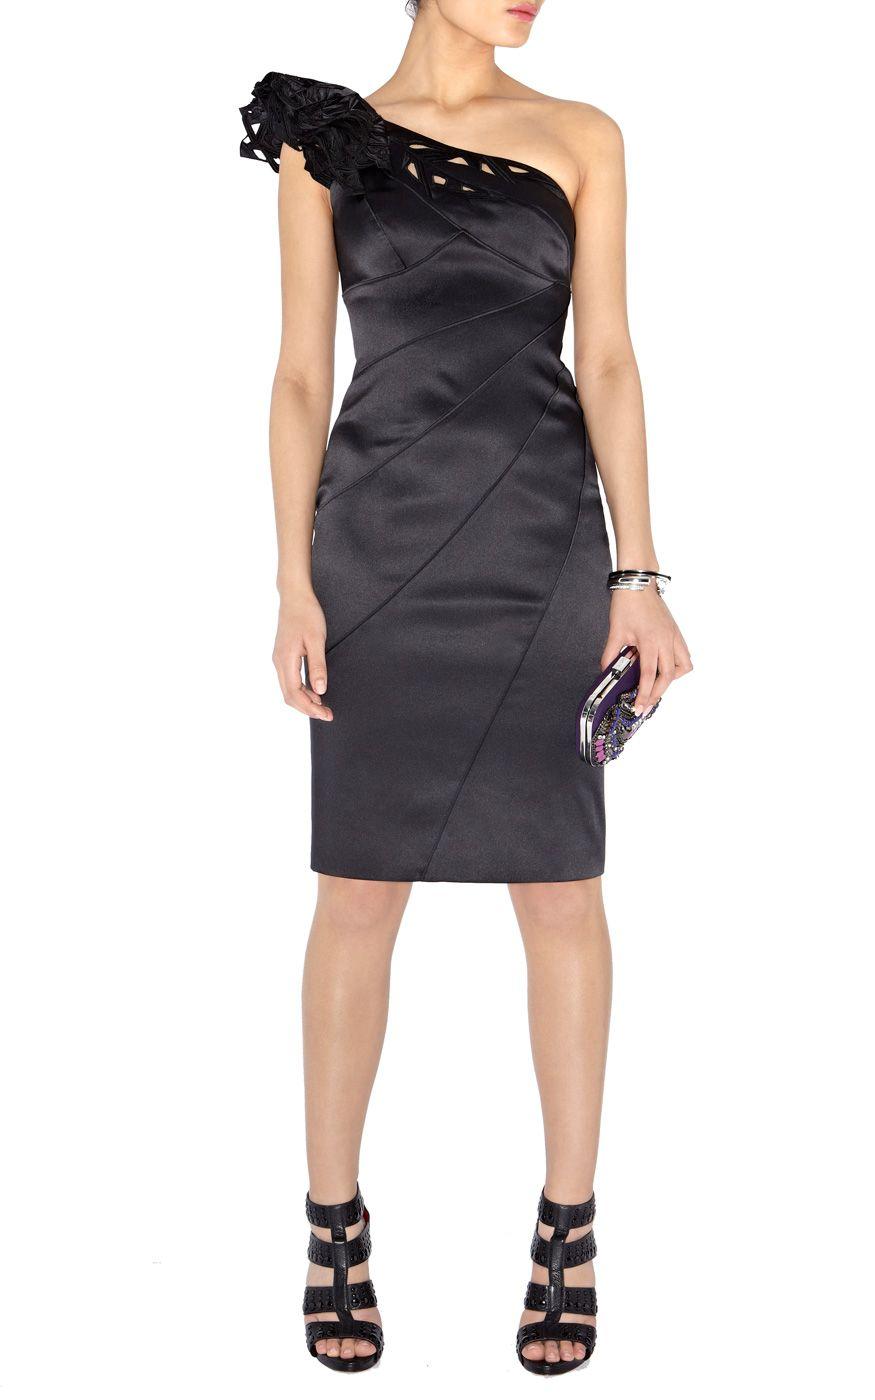 Black dress karen millen - Karen Millen Black One Shoulder Dresses Karen Millen Dl035 Black Cutwork One Shoulder Dress